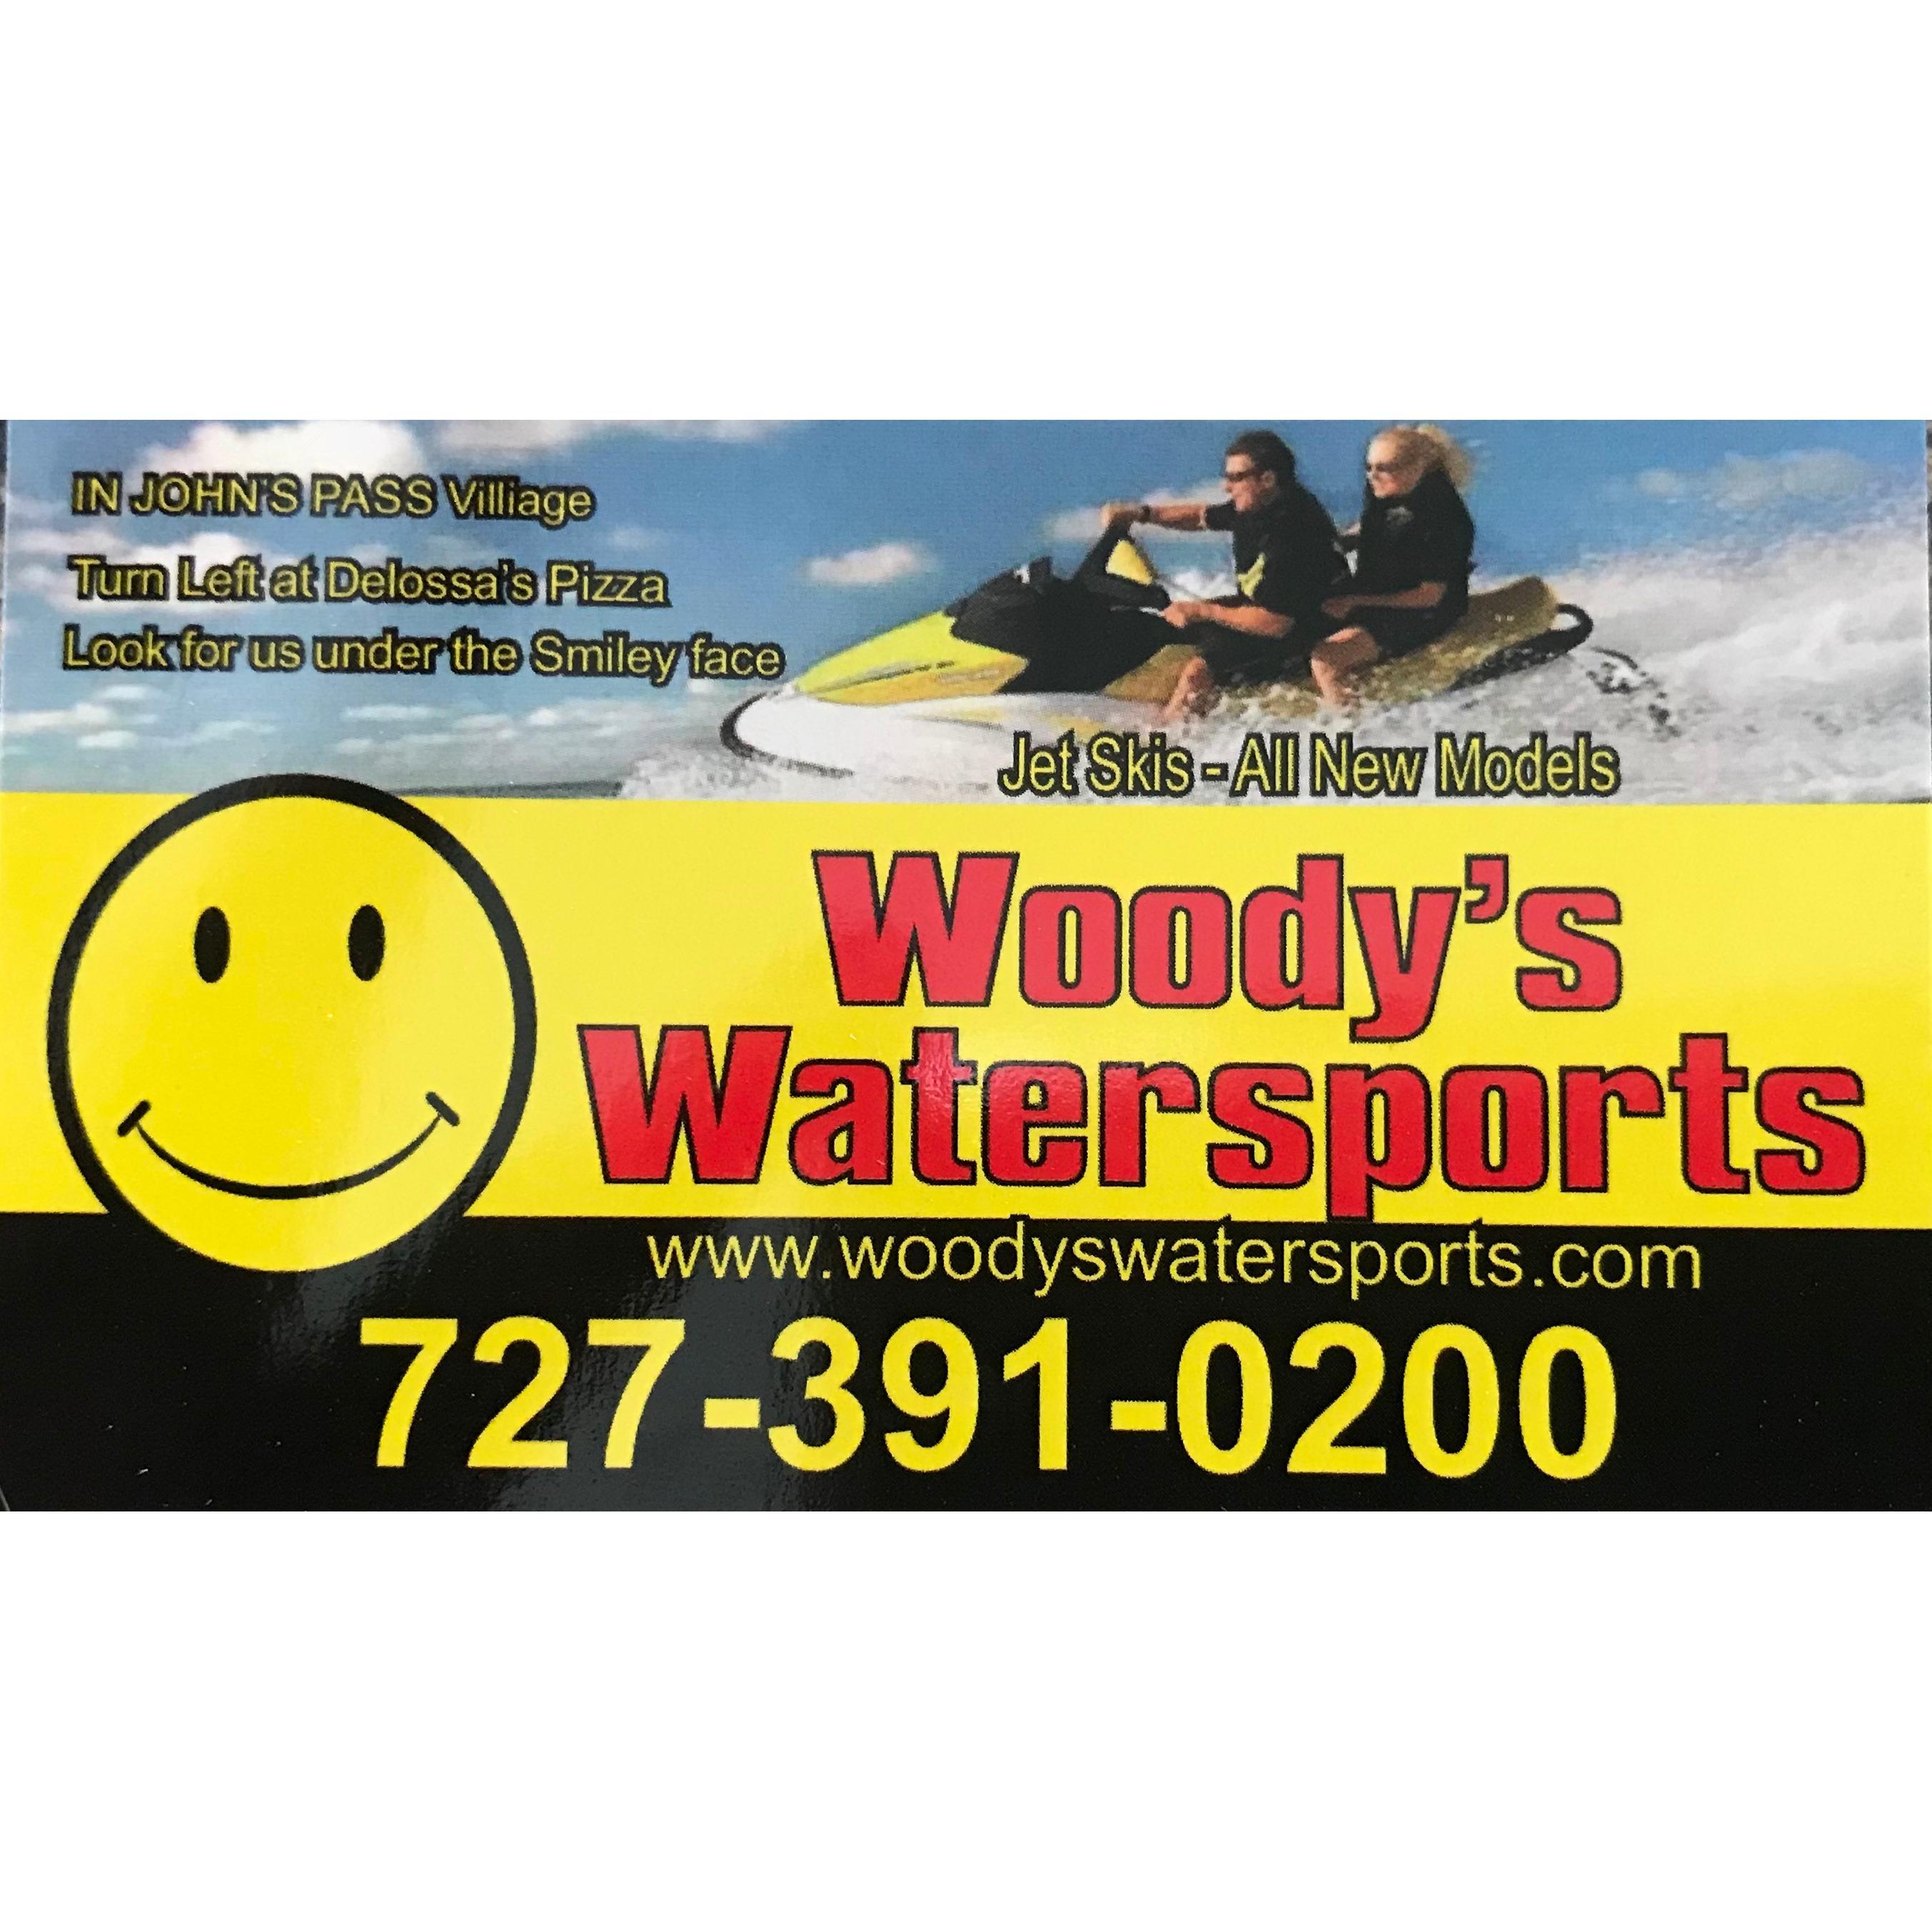 Woody's Watersports LLC